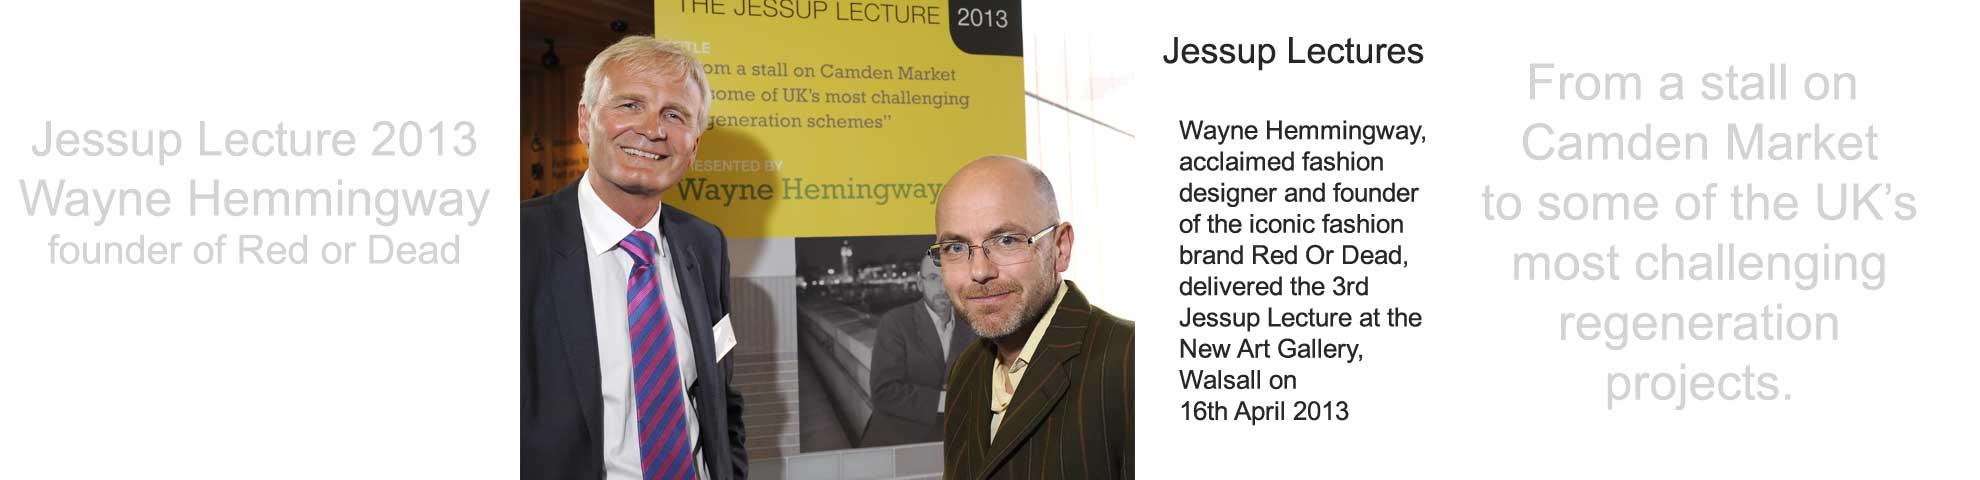 jessup_slider_Lectures_WayneHemmingway